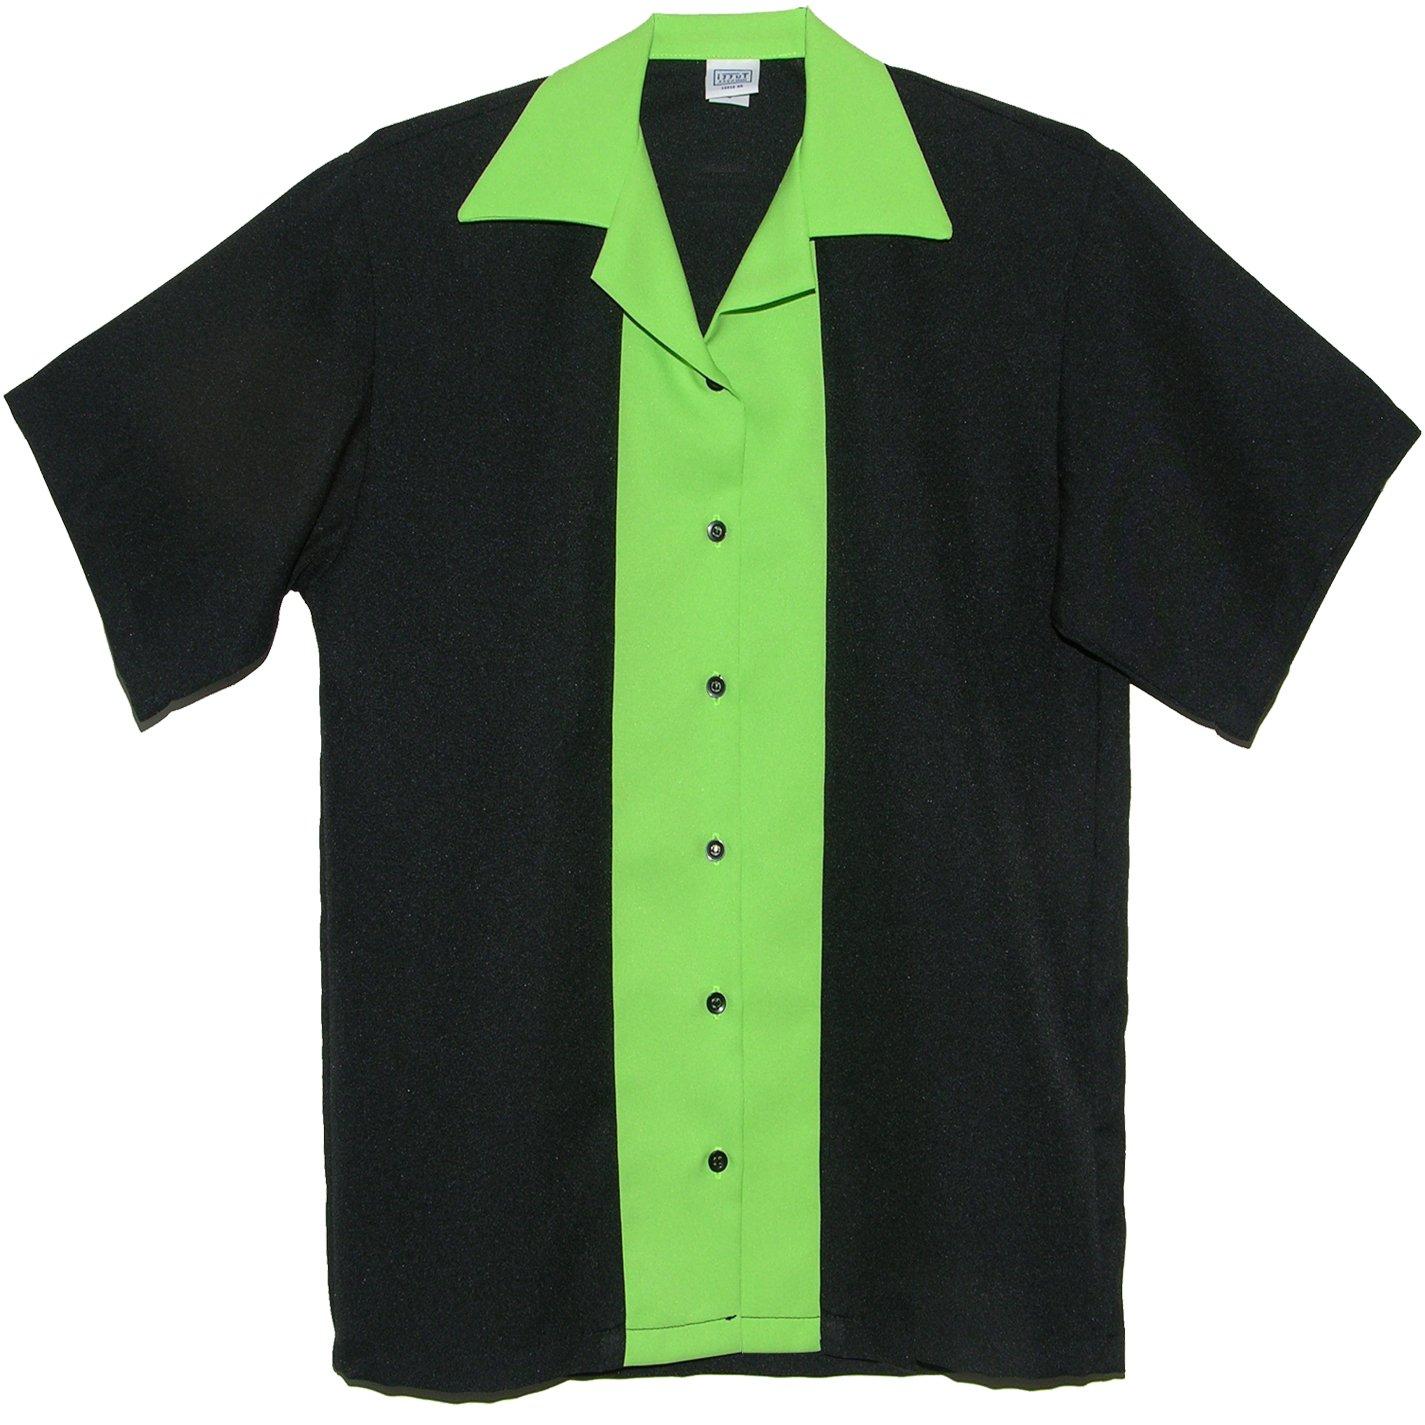 Tutti Ladies Retro Bowling Shirt 50's Style ~ Classic 57 Womens Bowling Shirts by (Small)